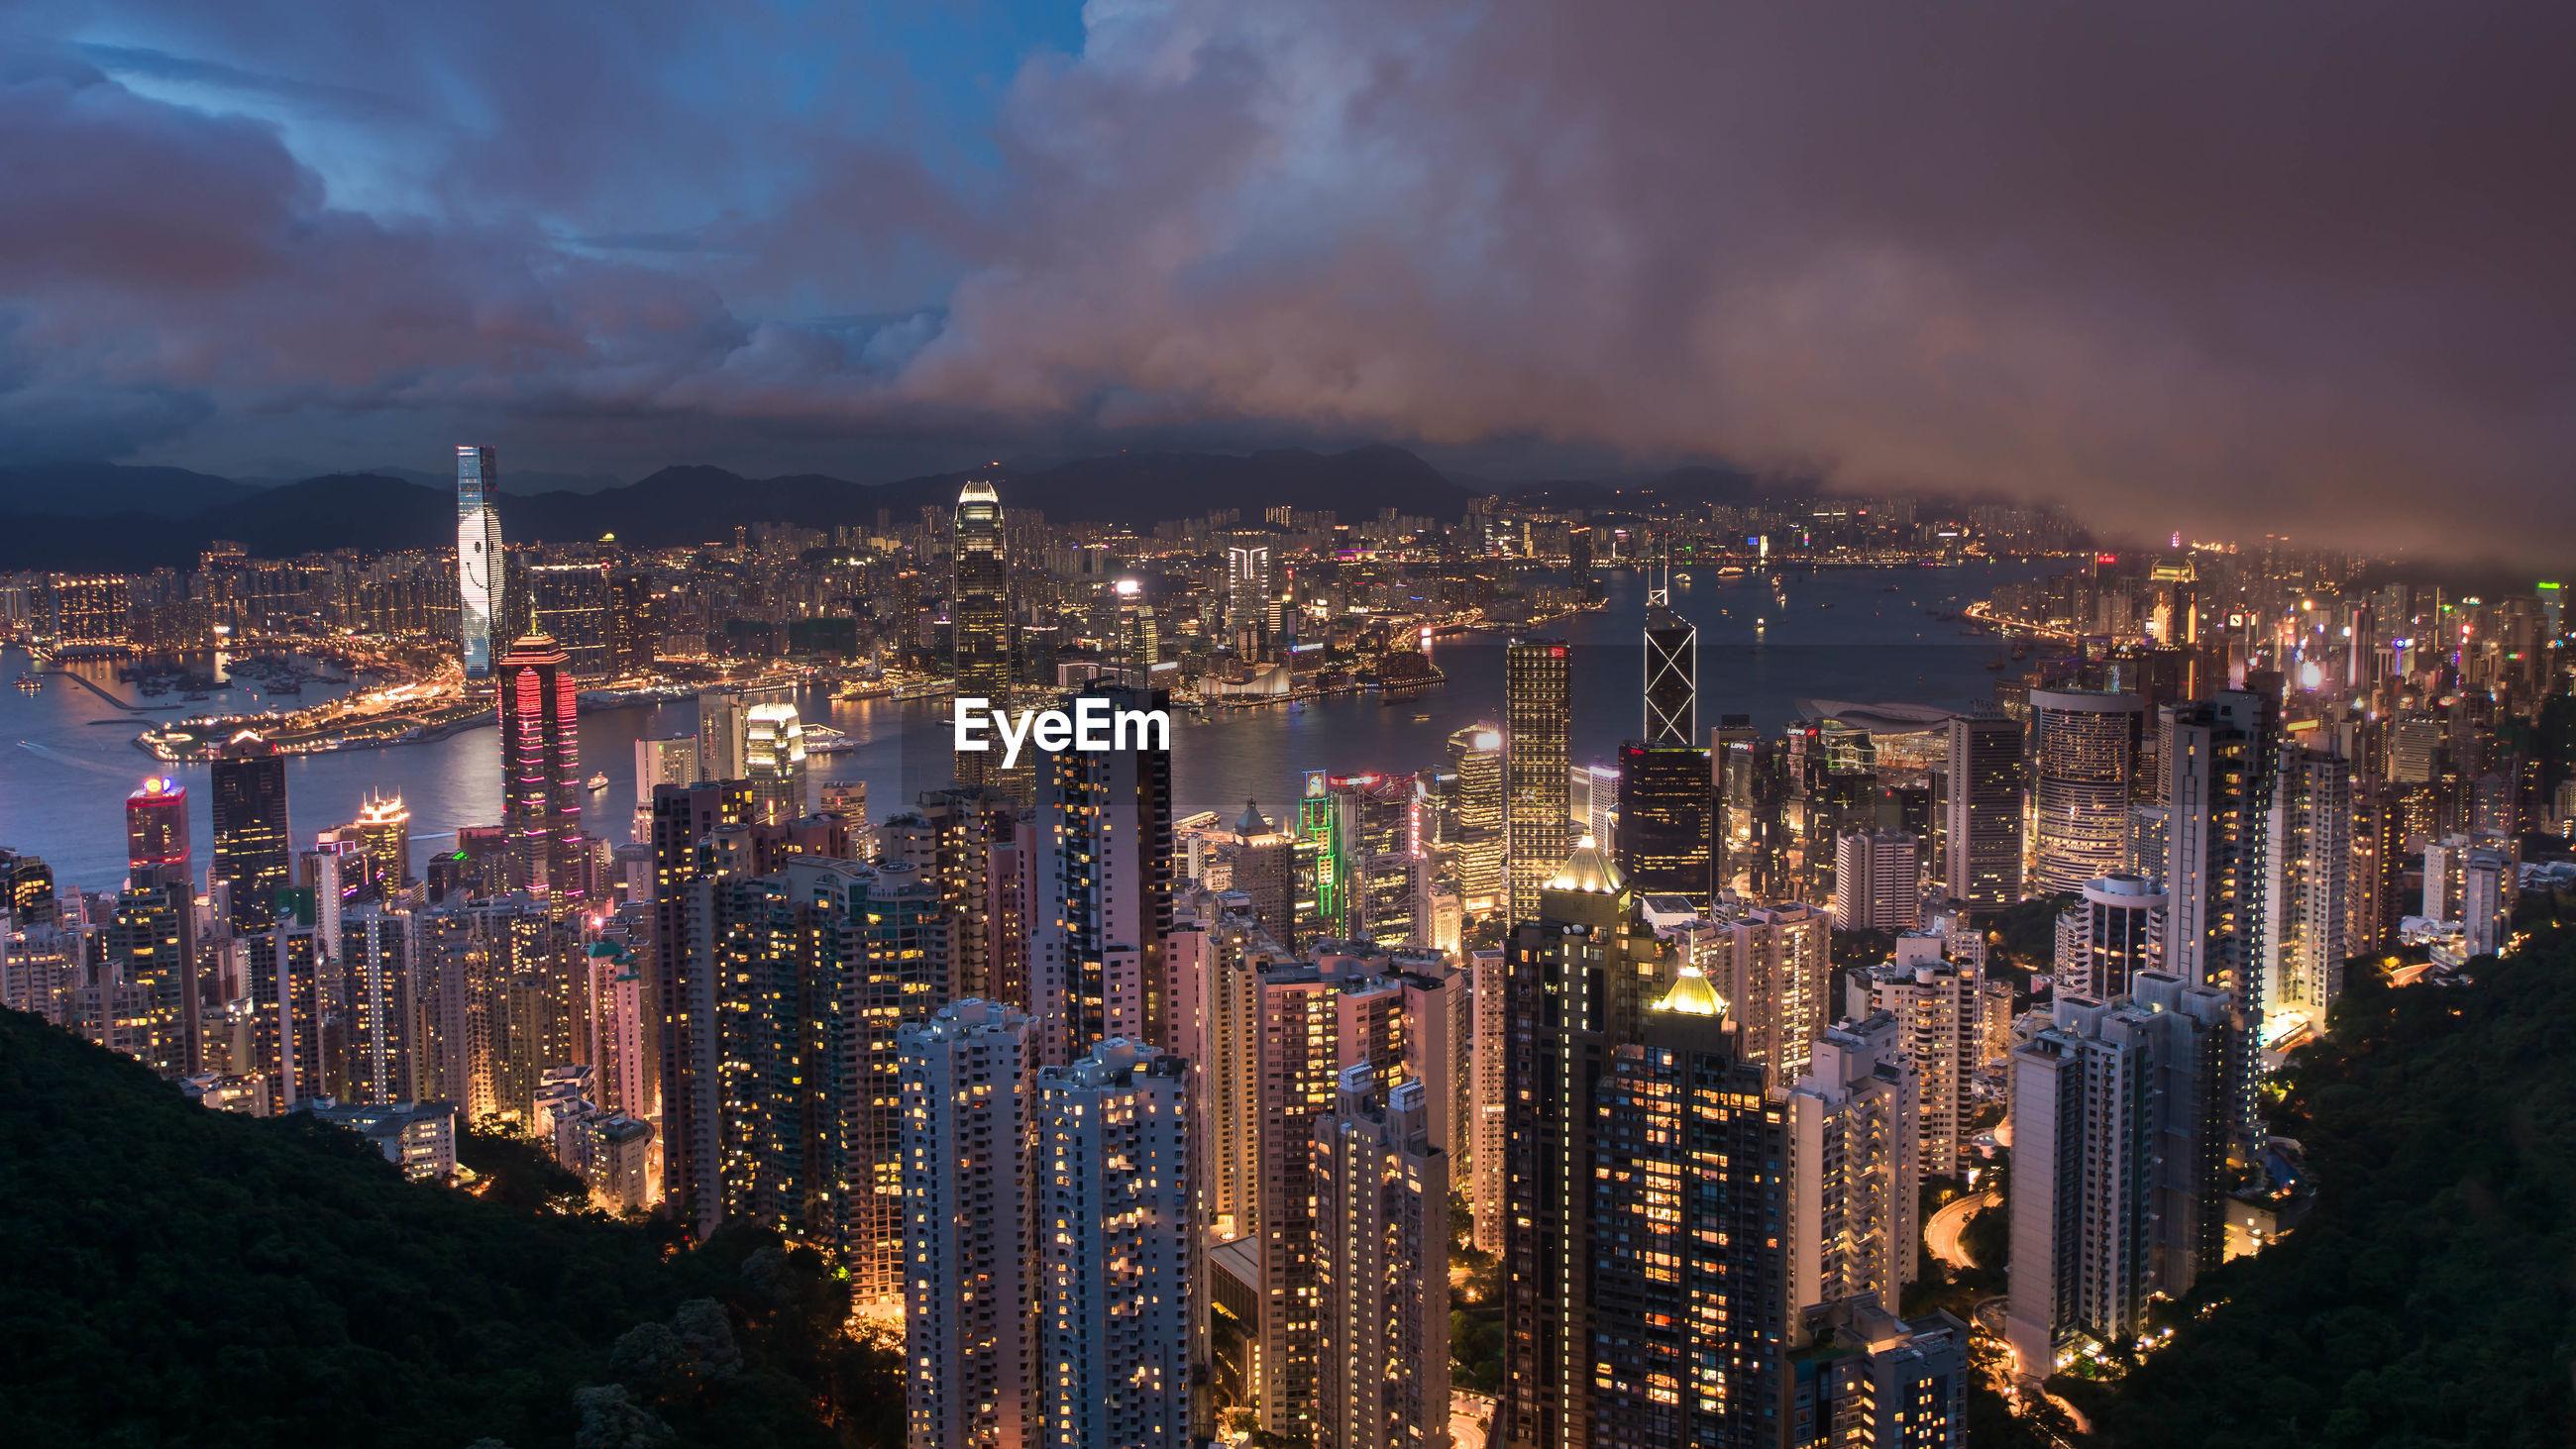 ILLUMINATED MODERN BUILDINGS IN CITY AGAINST SKY